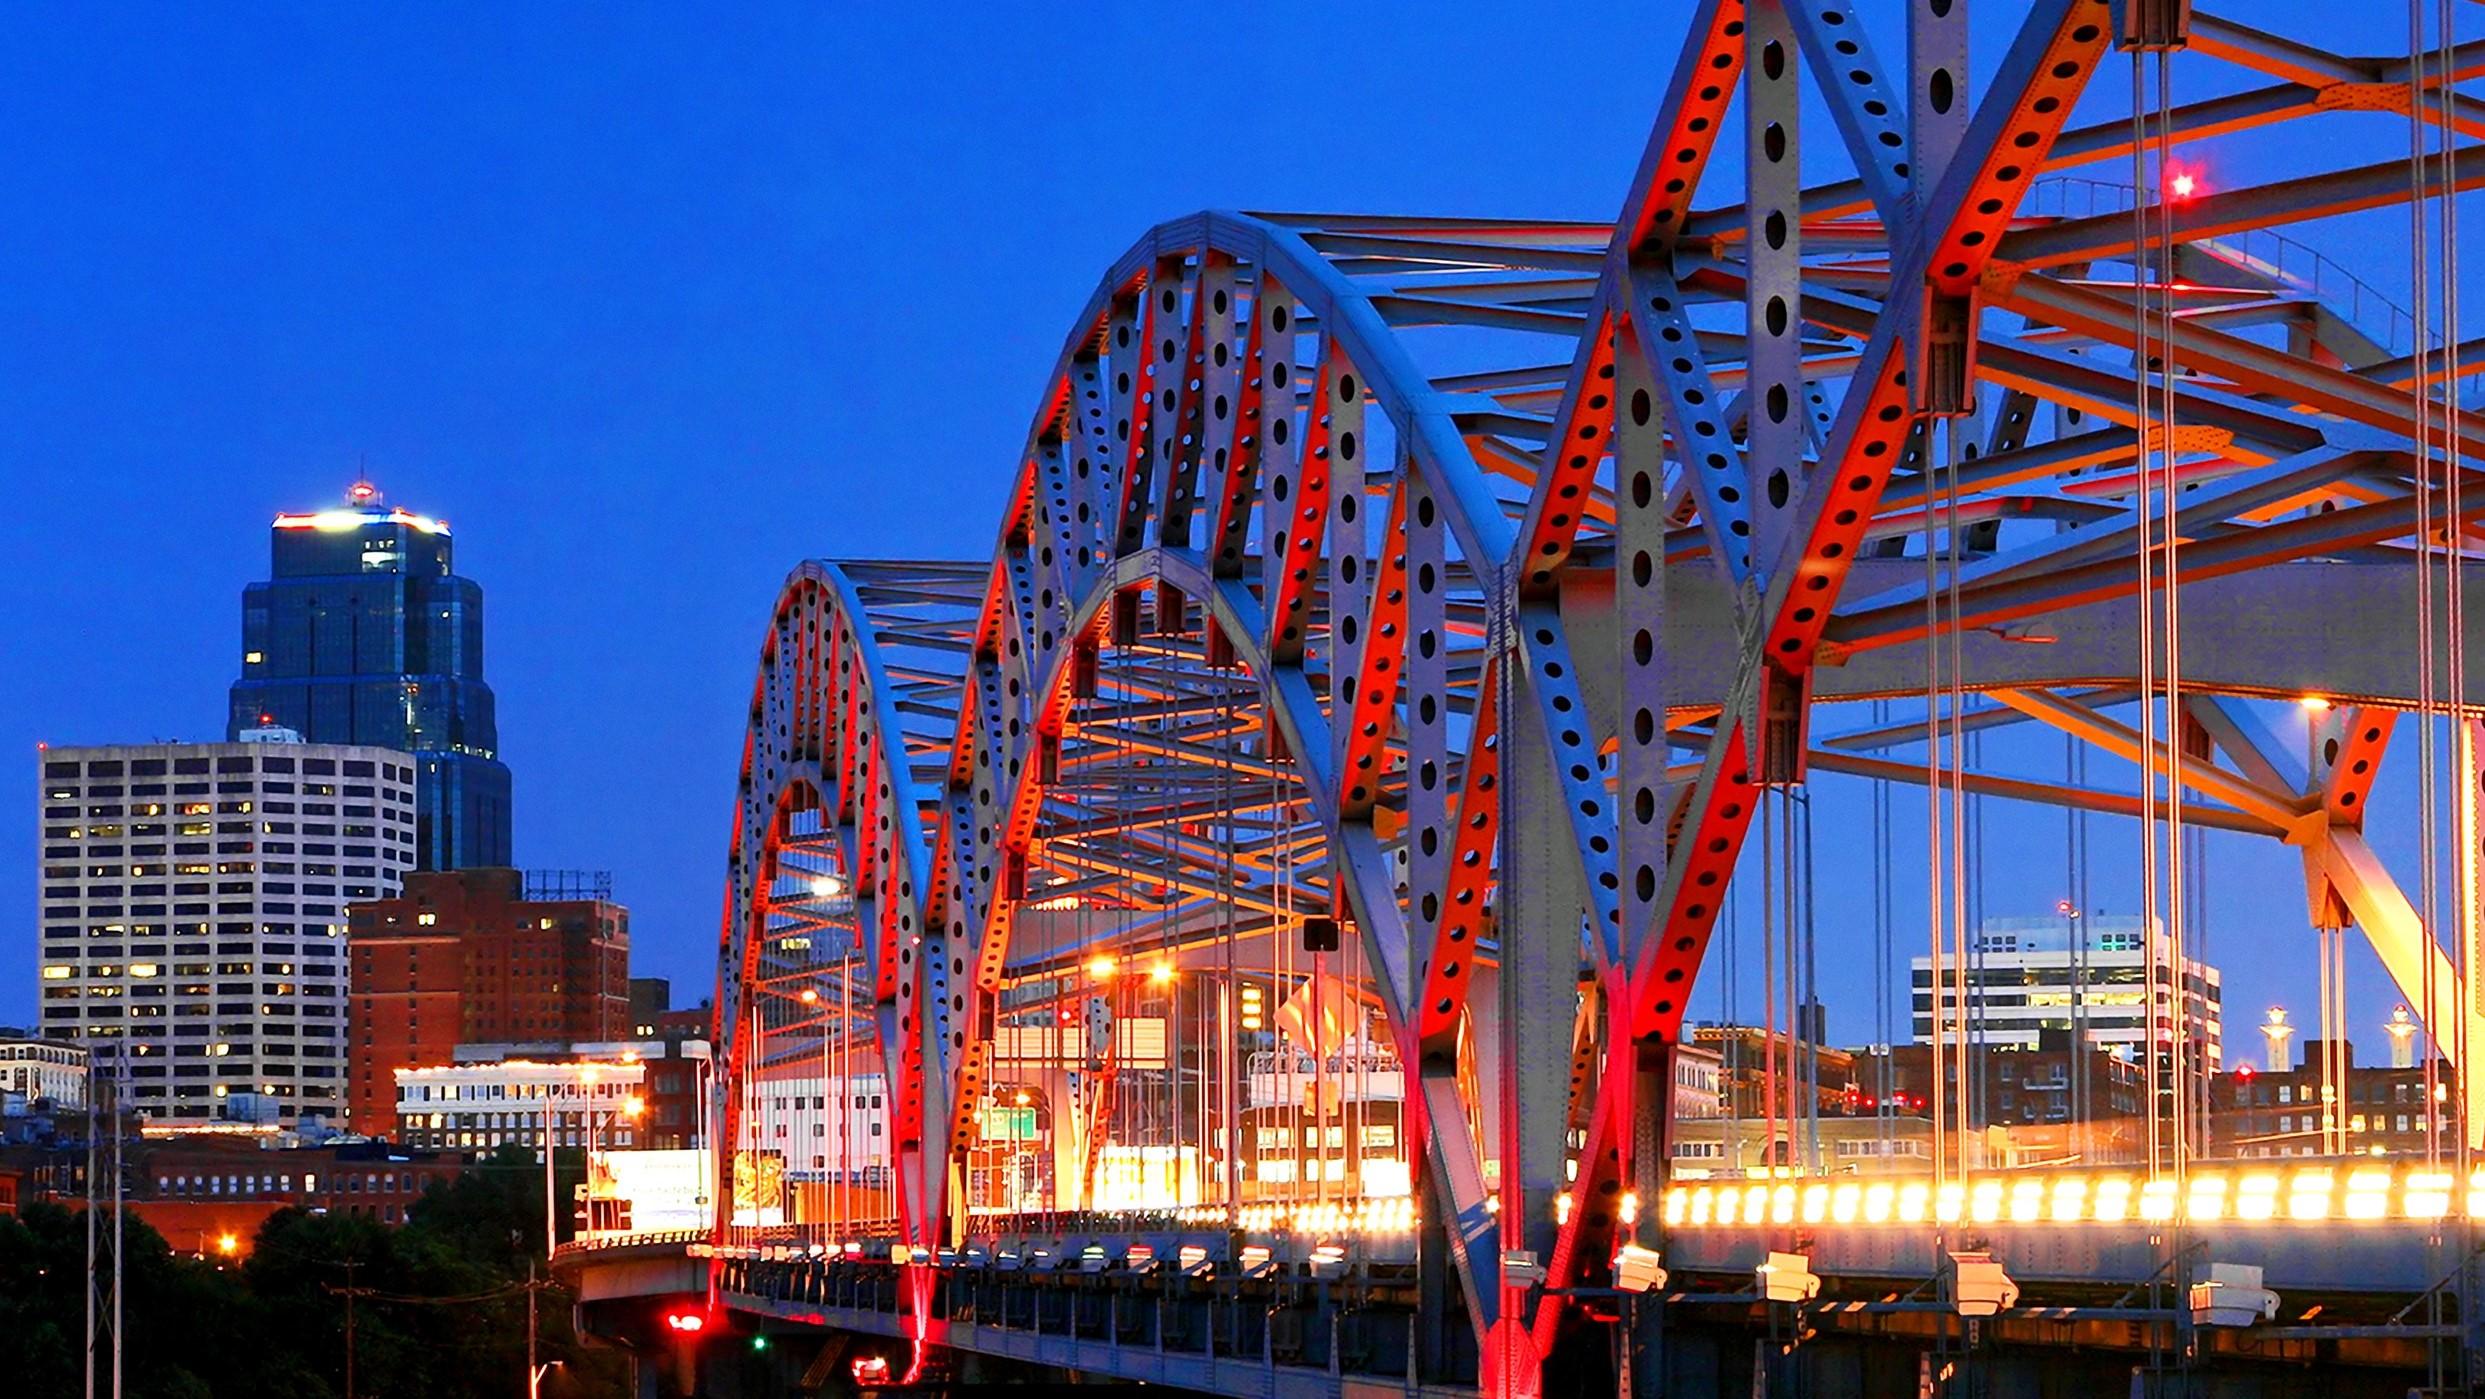 Broadway bridge heading into downtown Kansas City